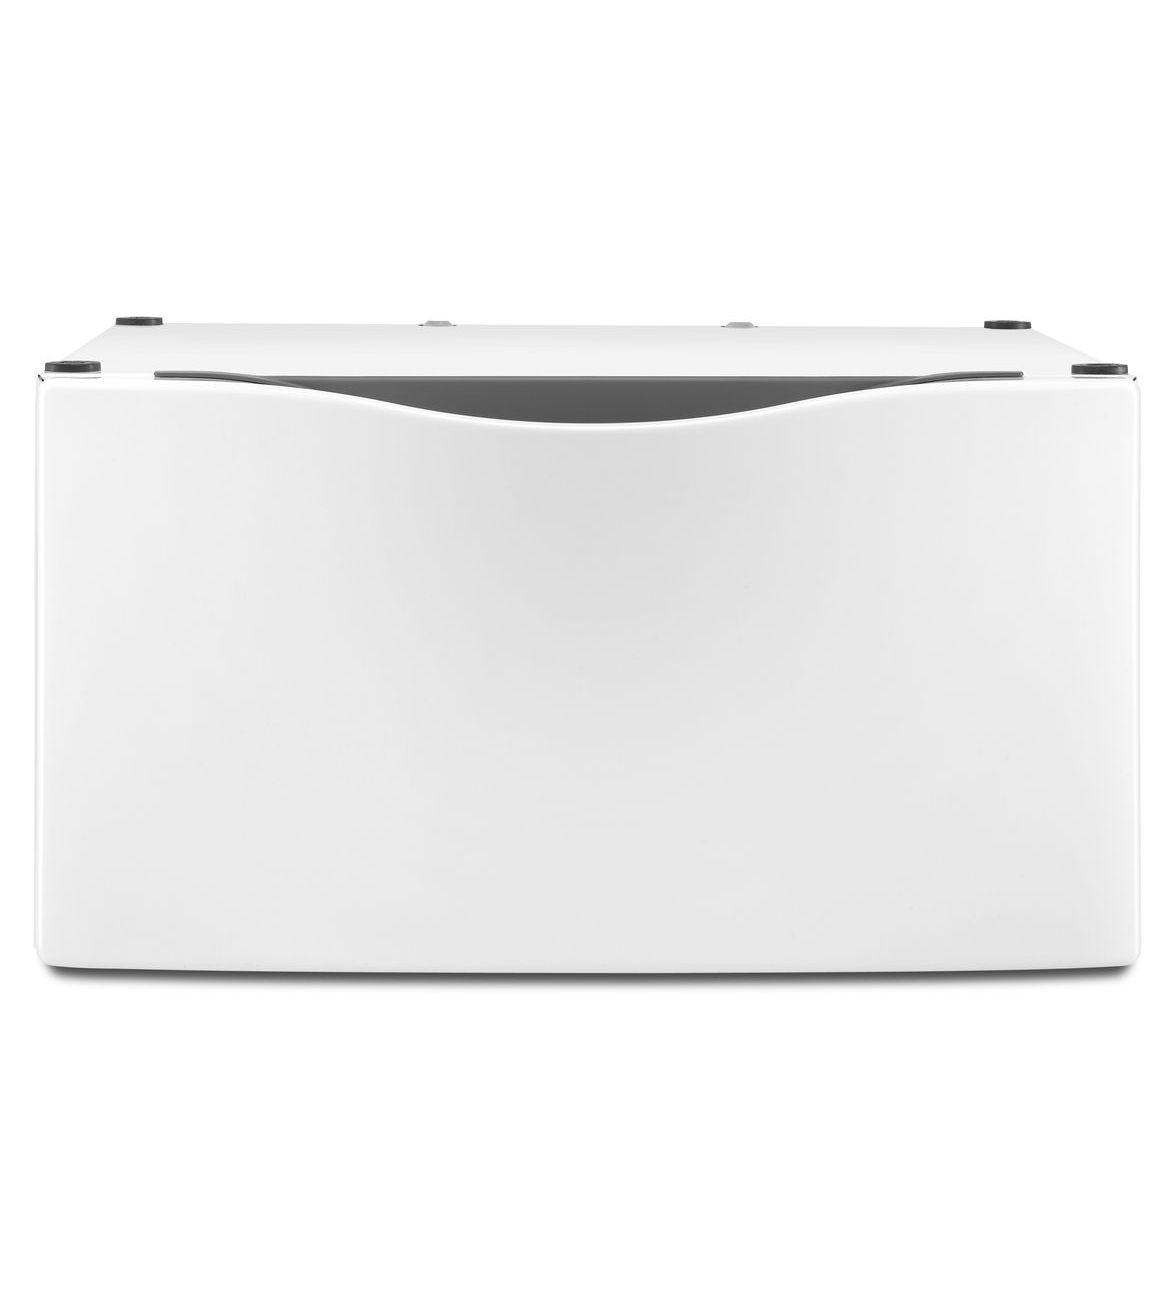 dryer washer pedestal lg installation maytag load front watch youtube